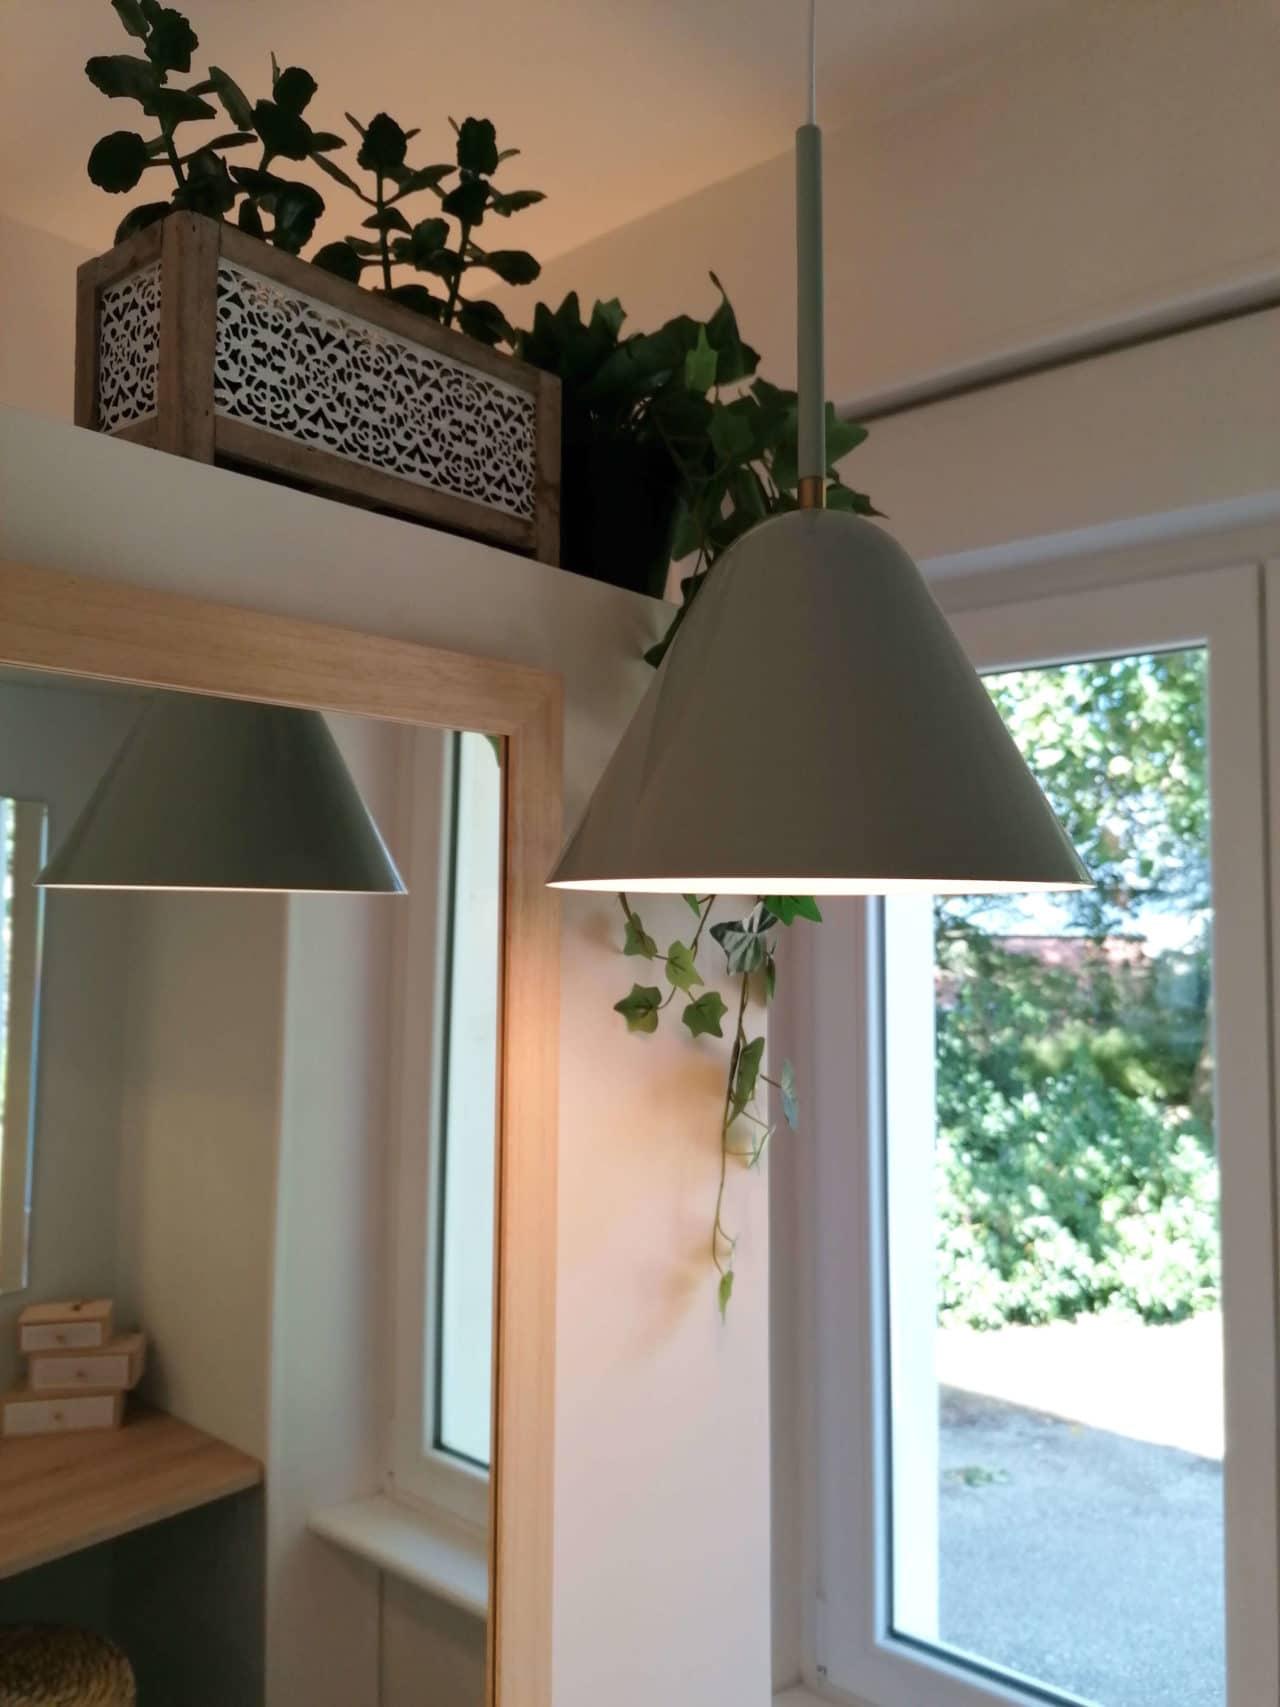 suspension verte plante verte miroir salle de bains